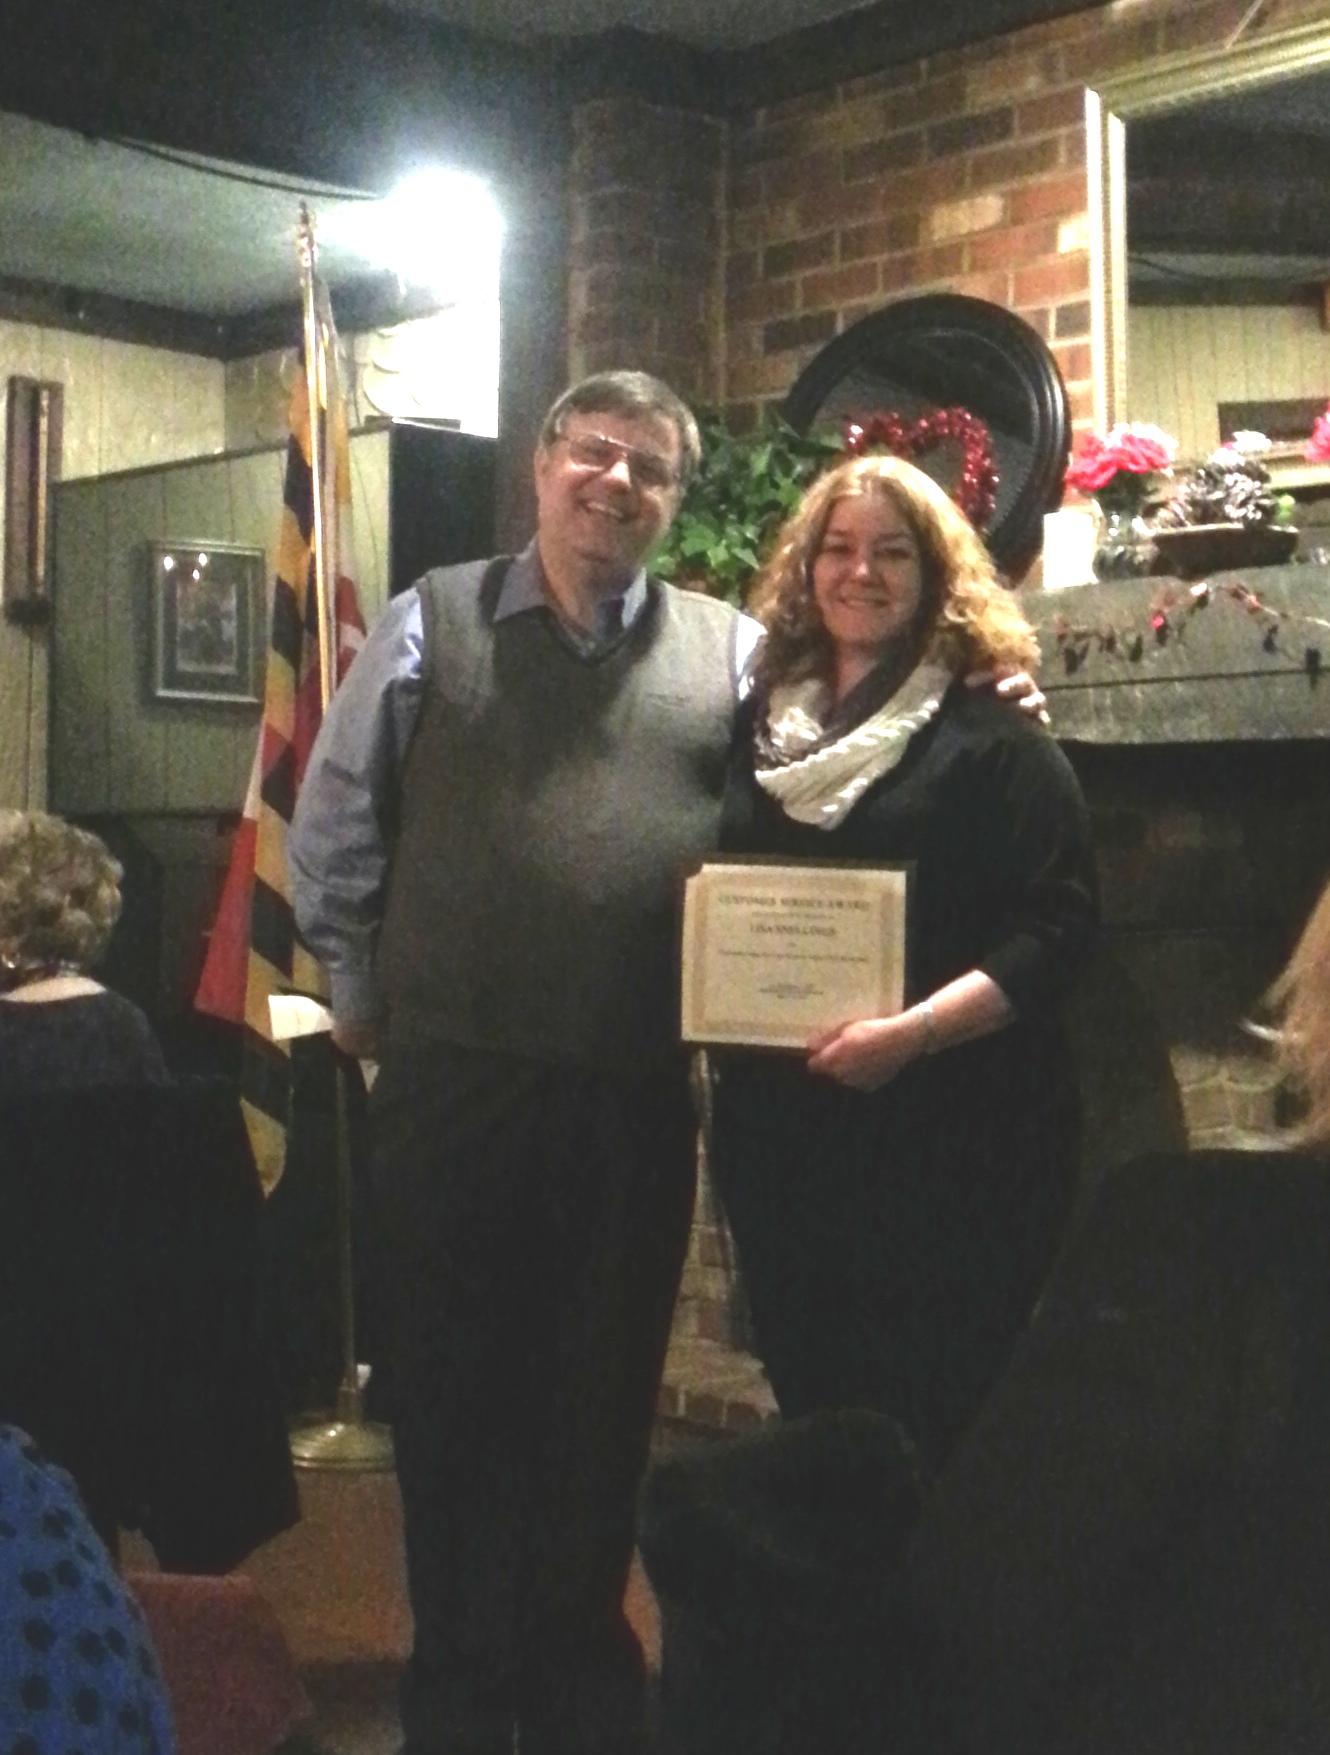 Lisa Award